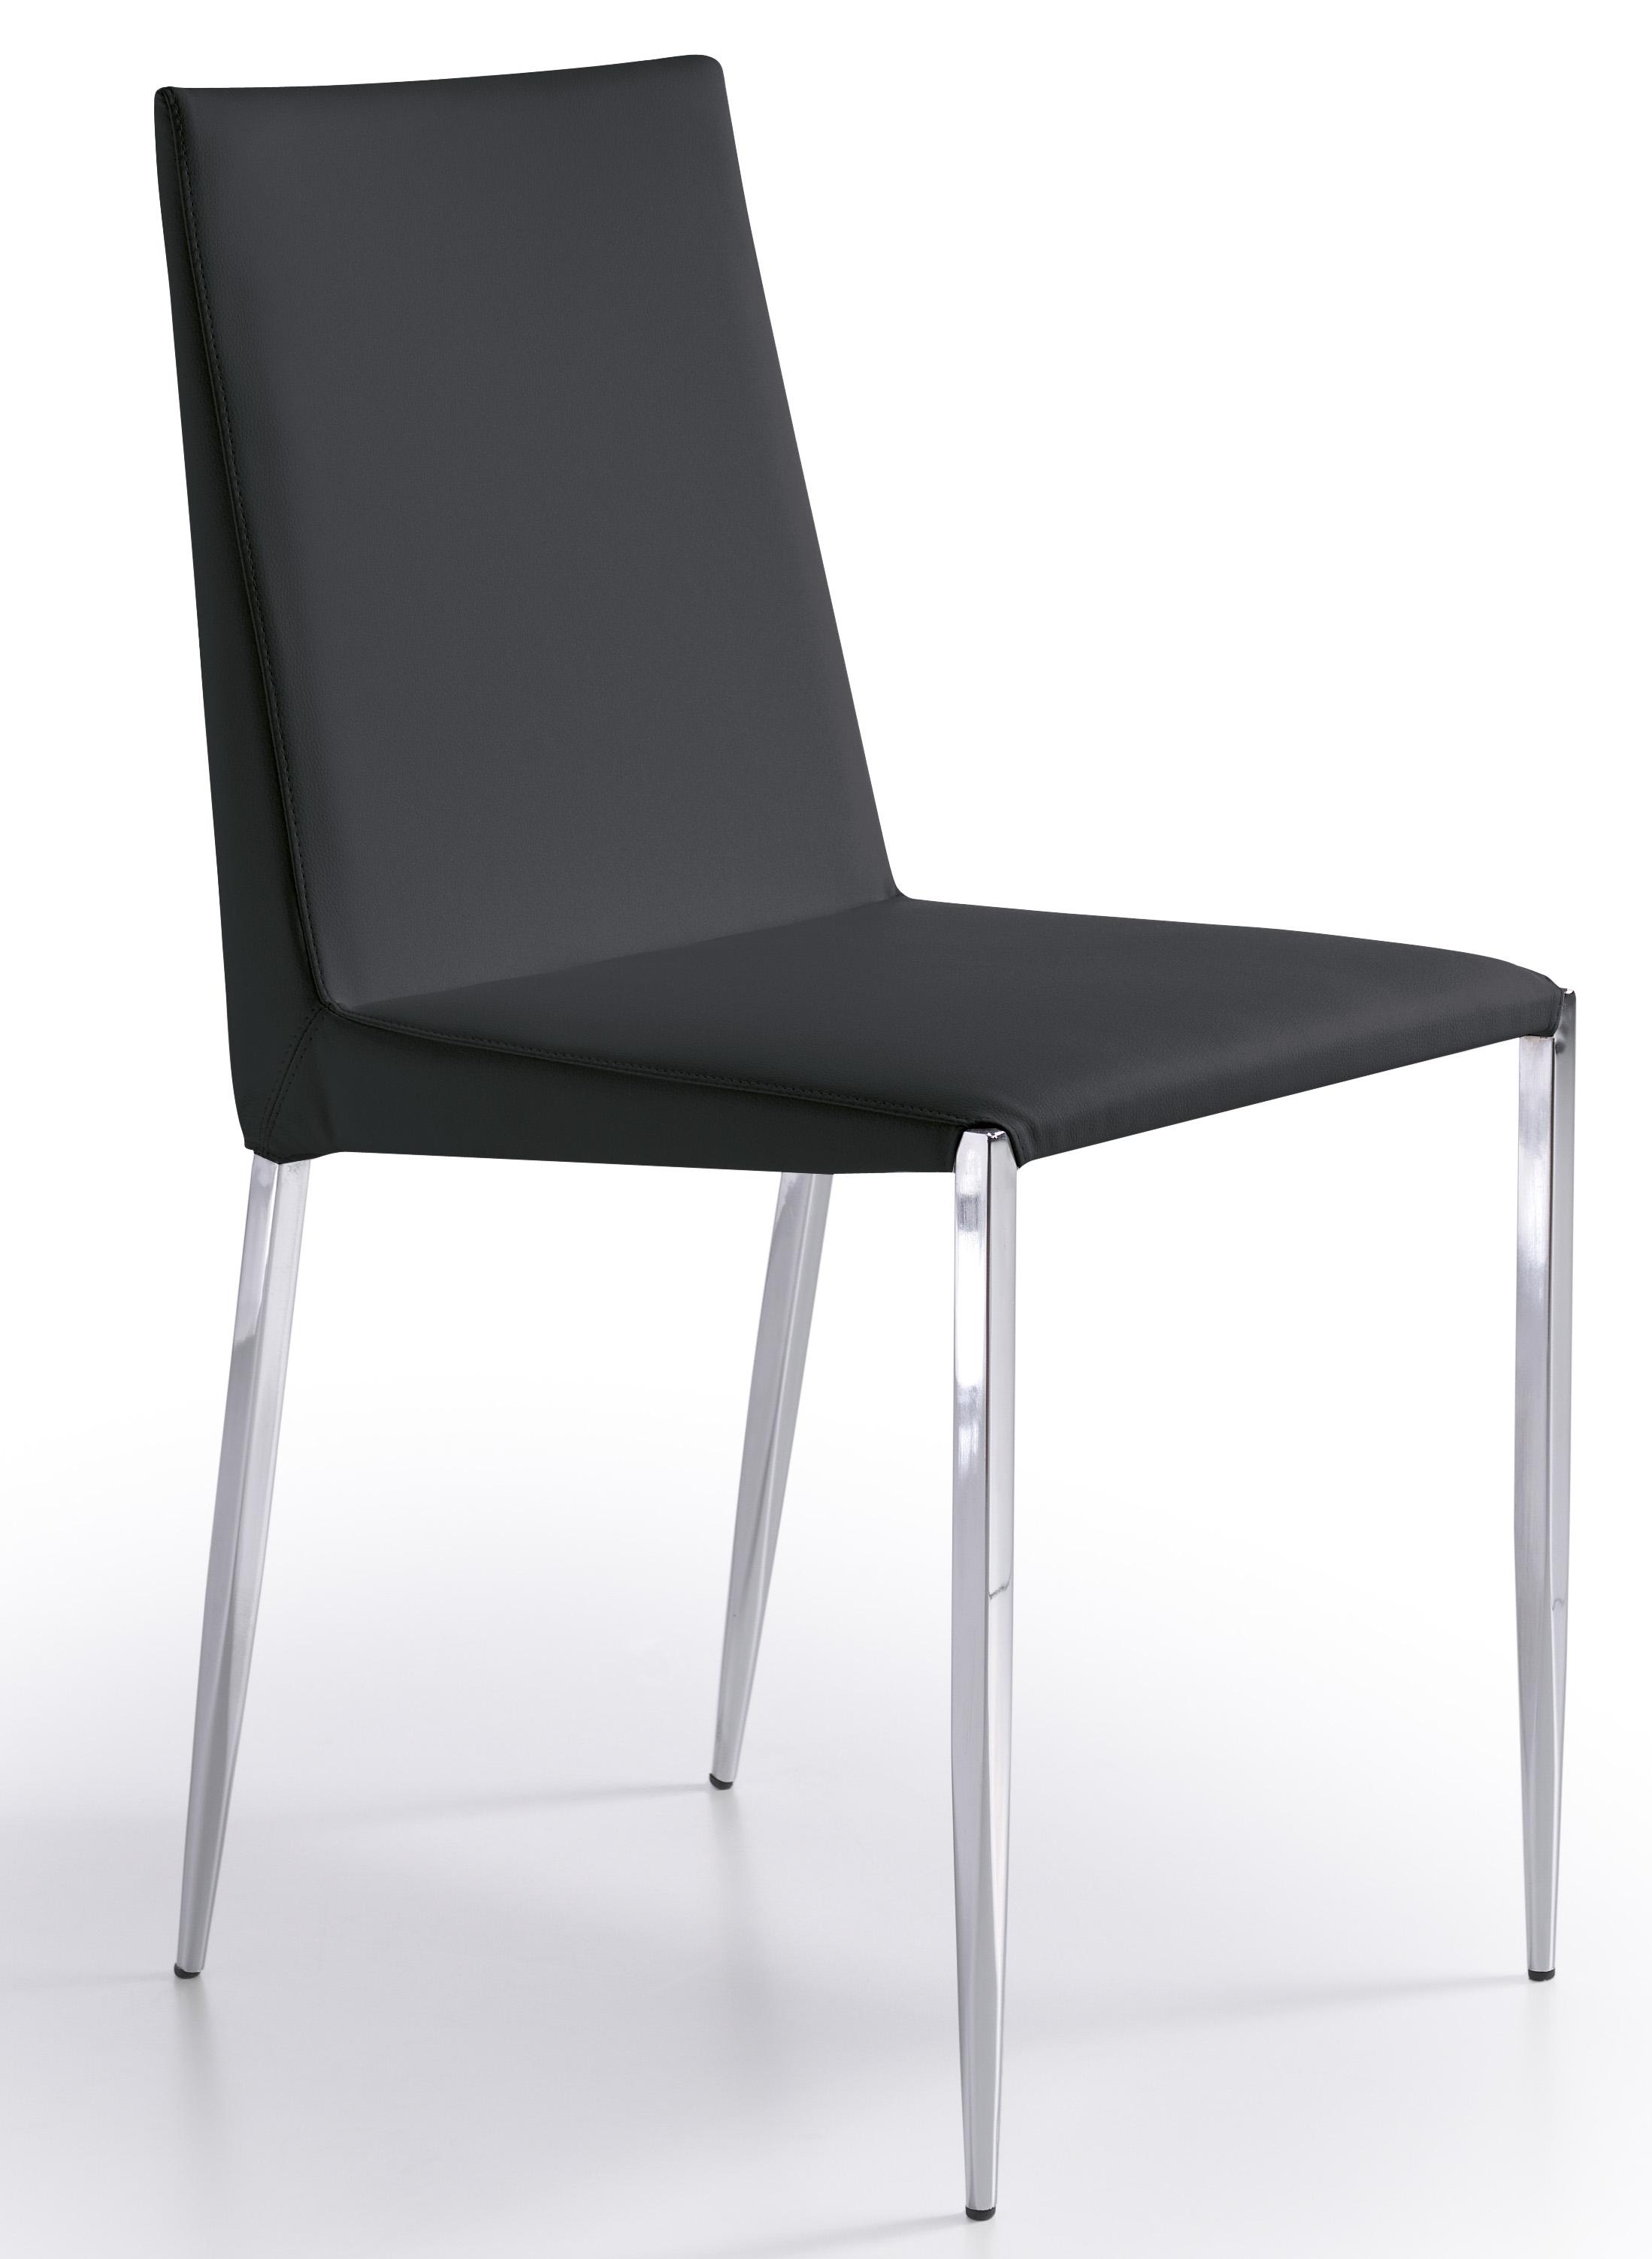 chaise design noir oliva lot de 2. Black Bedroom Furniture Sets. Home Design Ideas